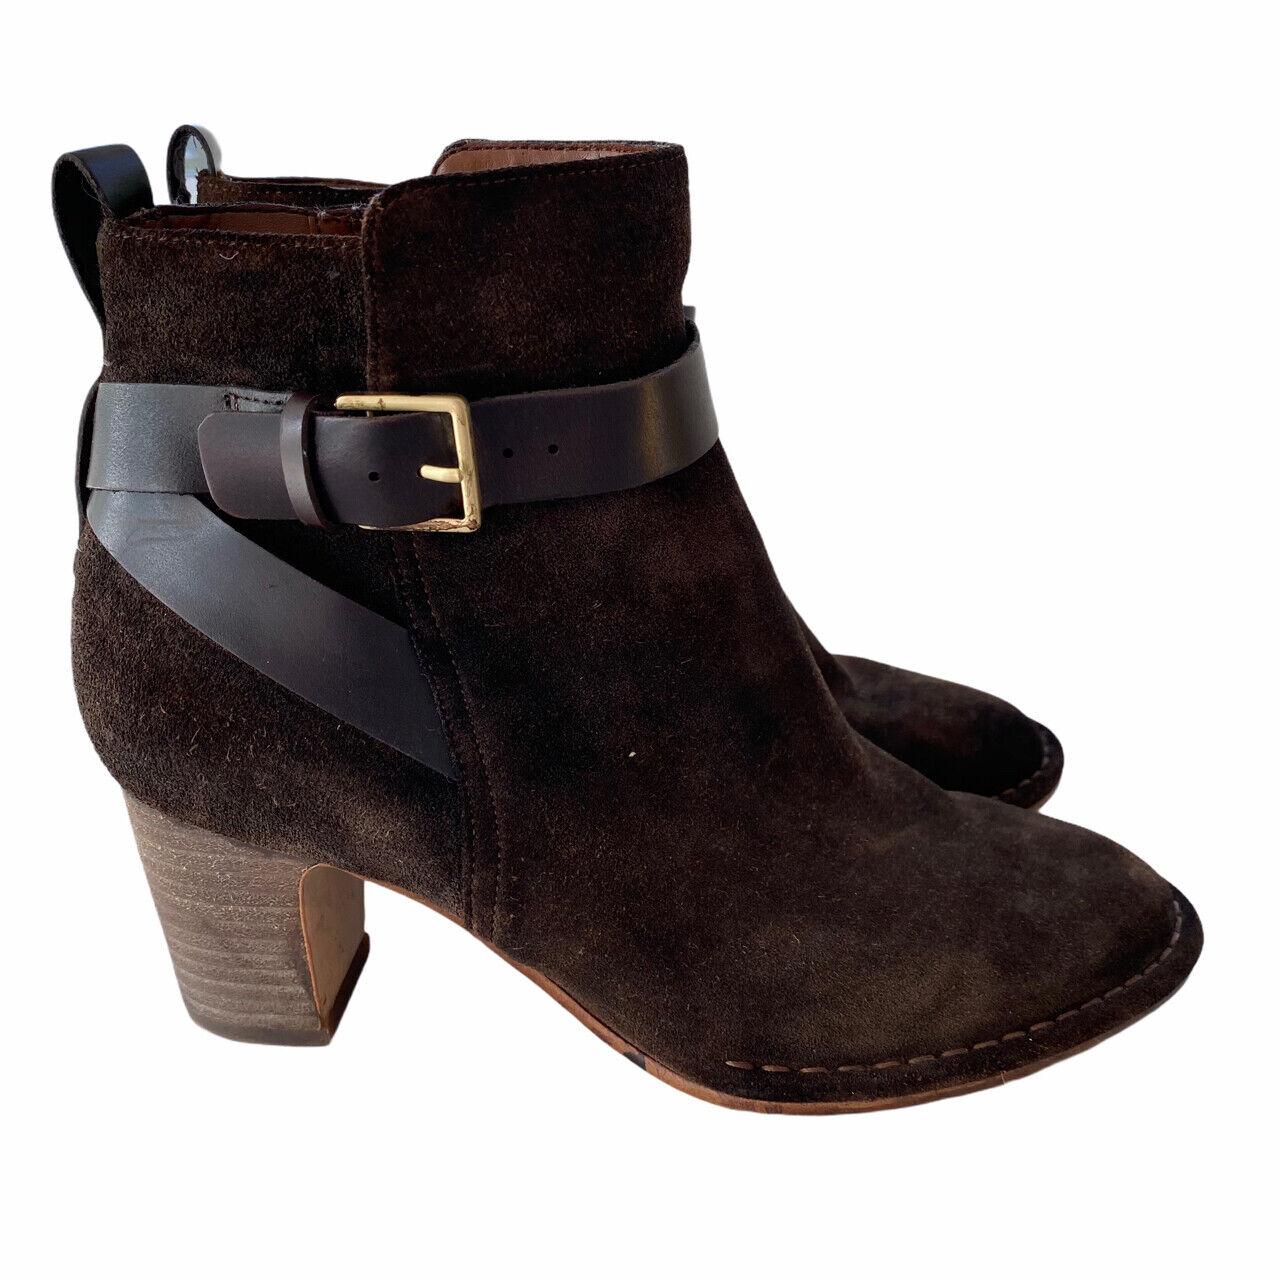 CLARKS Cushionsoft Dark Brown Suede Mid Heel Ankle Boots 5 UK / 38 EU / b4